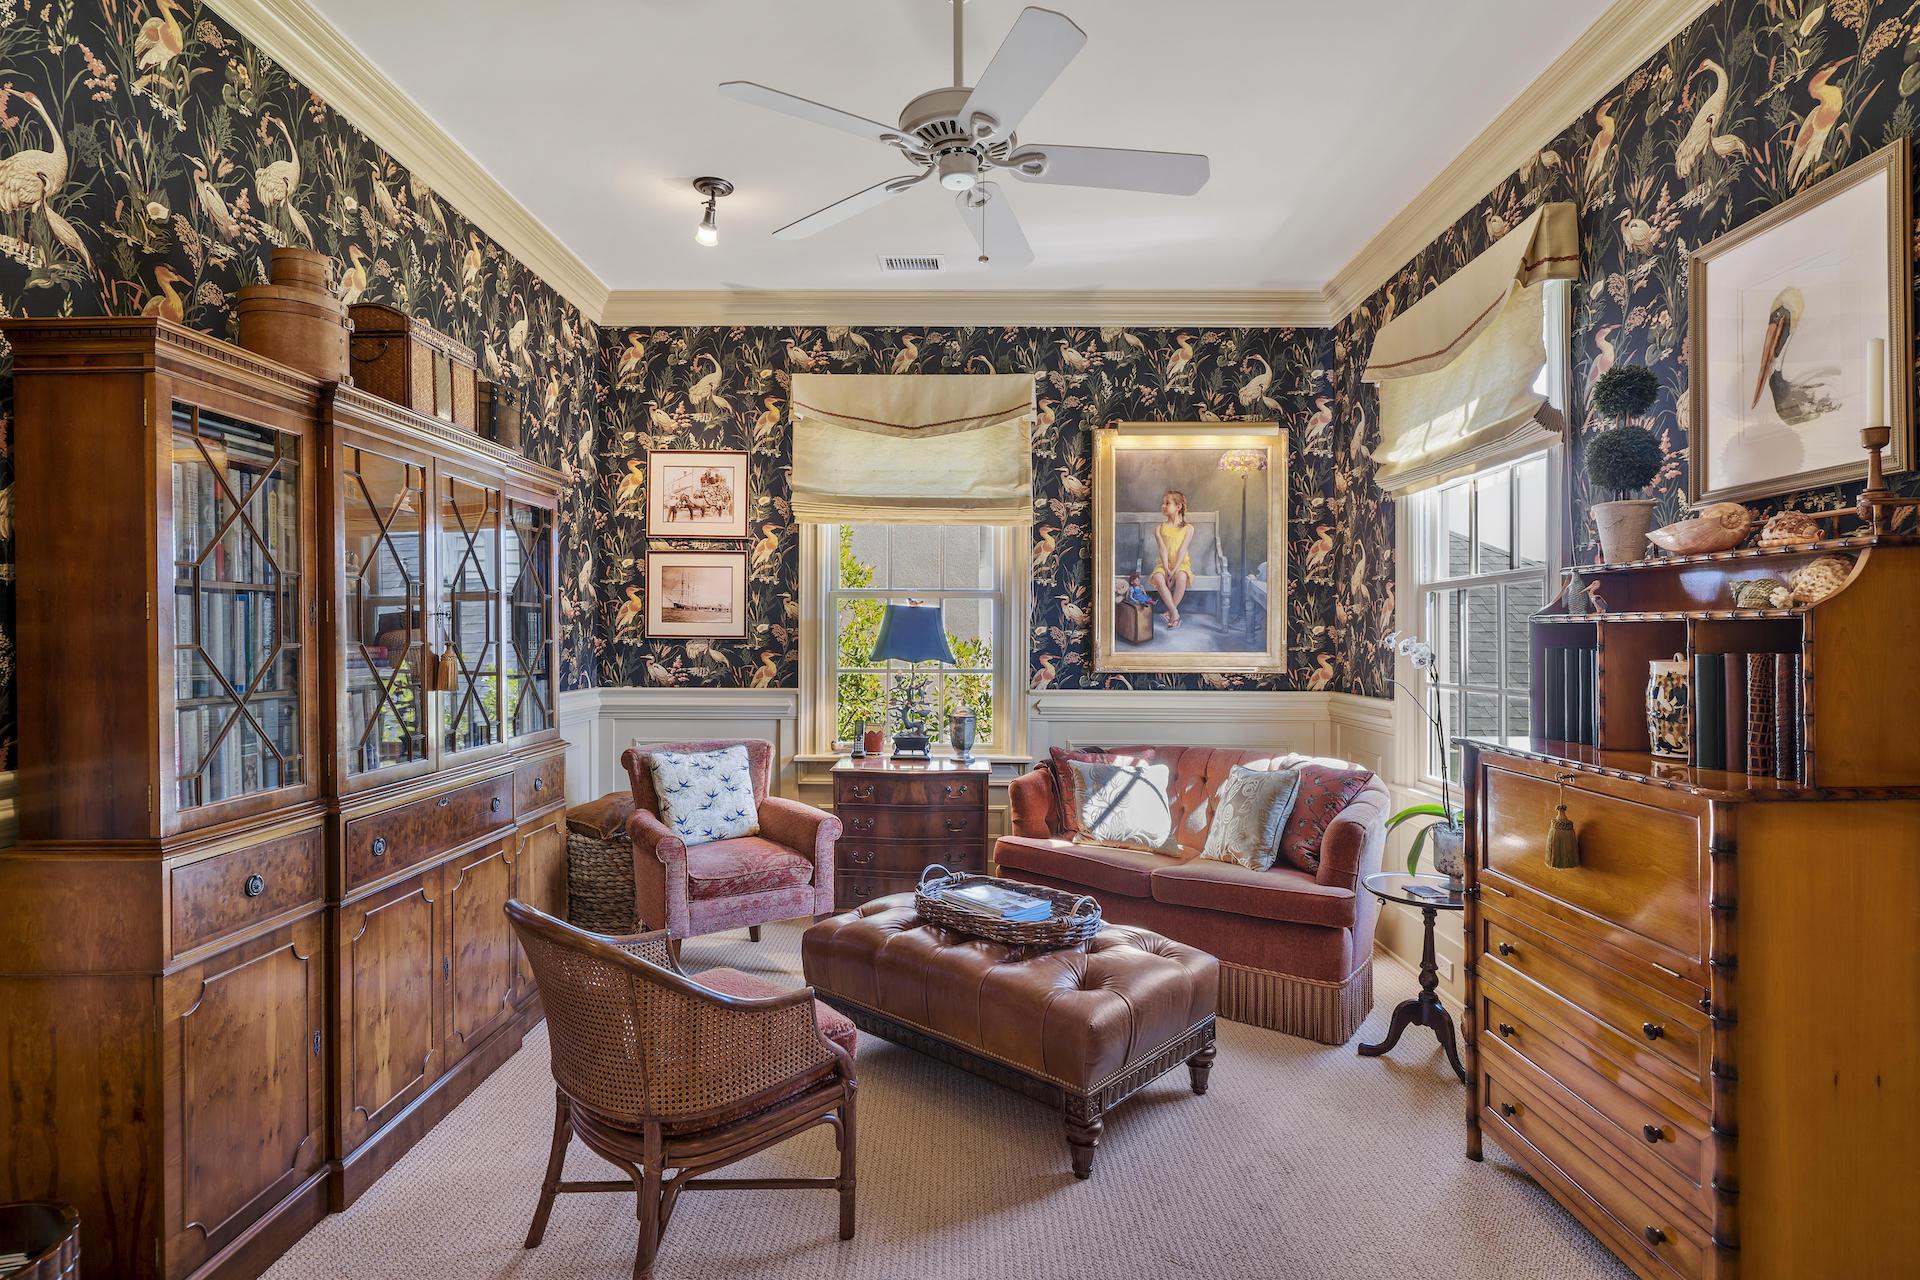 Daniel Island Homes For Sale - 623 Island Park, Charleston, SC - 11